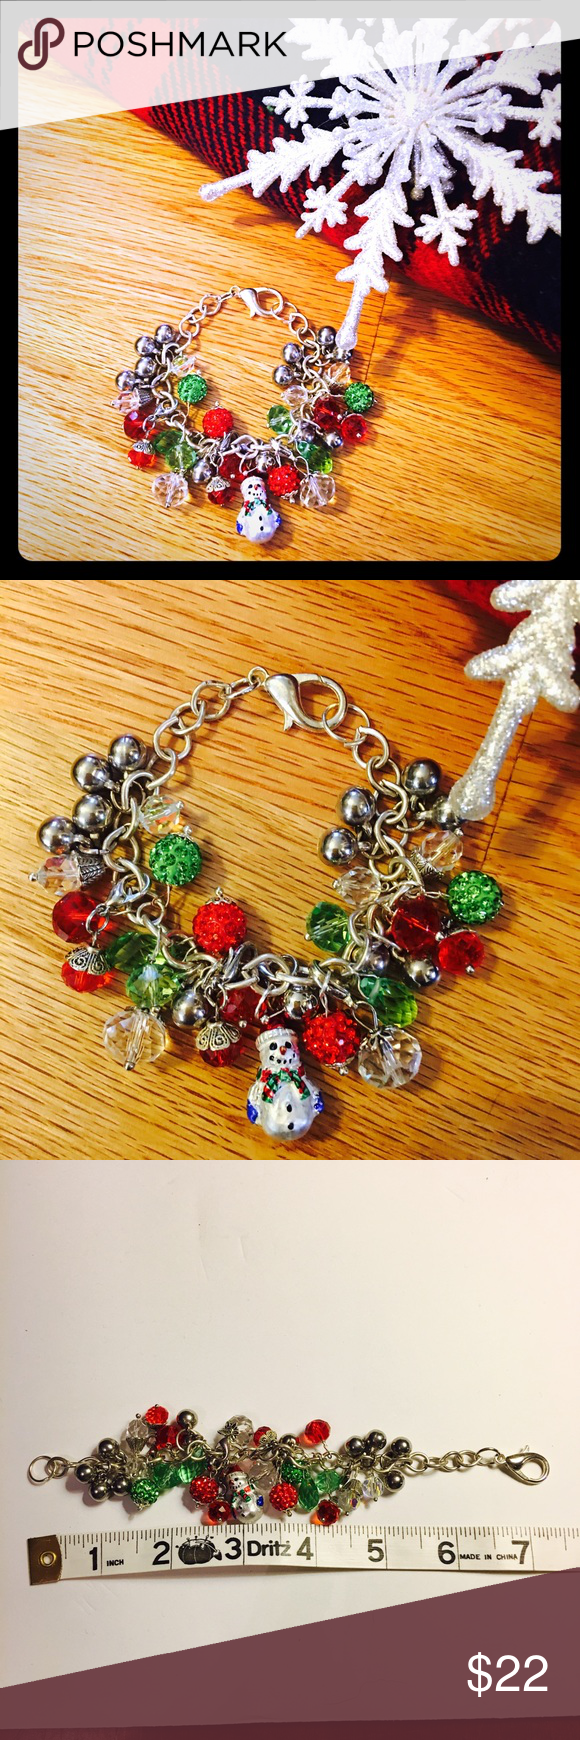 🎄SNOWMAN & SWAROVSKI CRYSTAL CHARMS BRACELET Handmade bracelet. Please see photos for sizing. gibaravintage Jewelry Bracelets